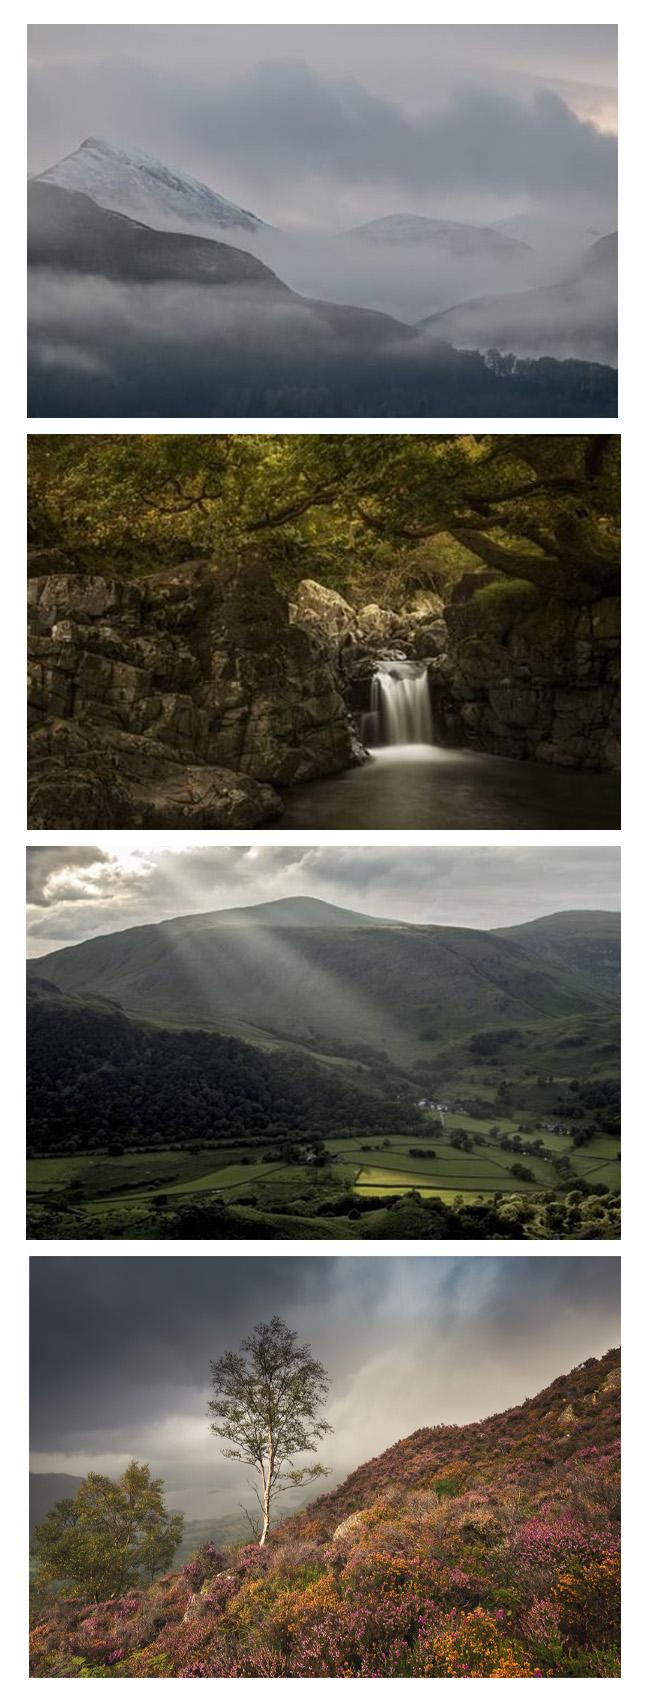 Top three:Carmen Norman Photography  Bottom Image: Stuart McGlennon Photography